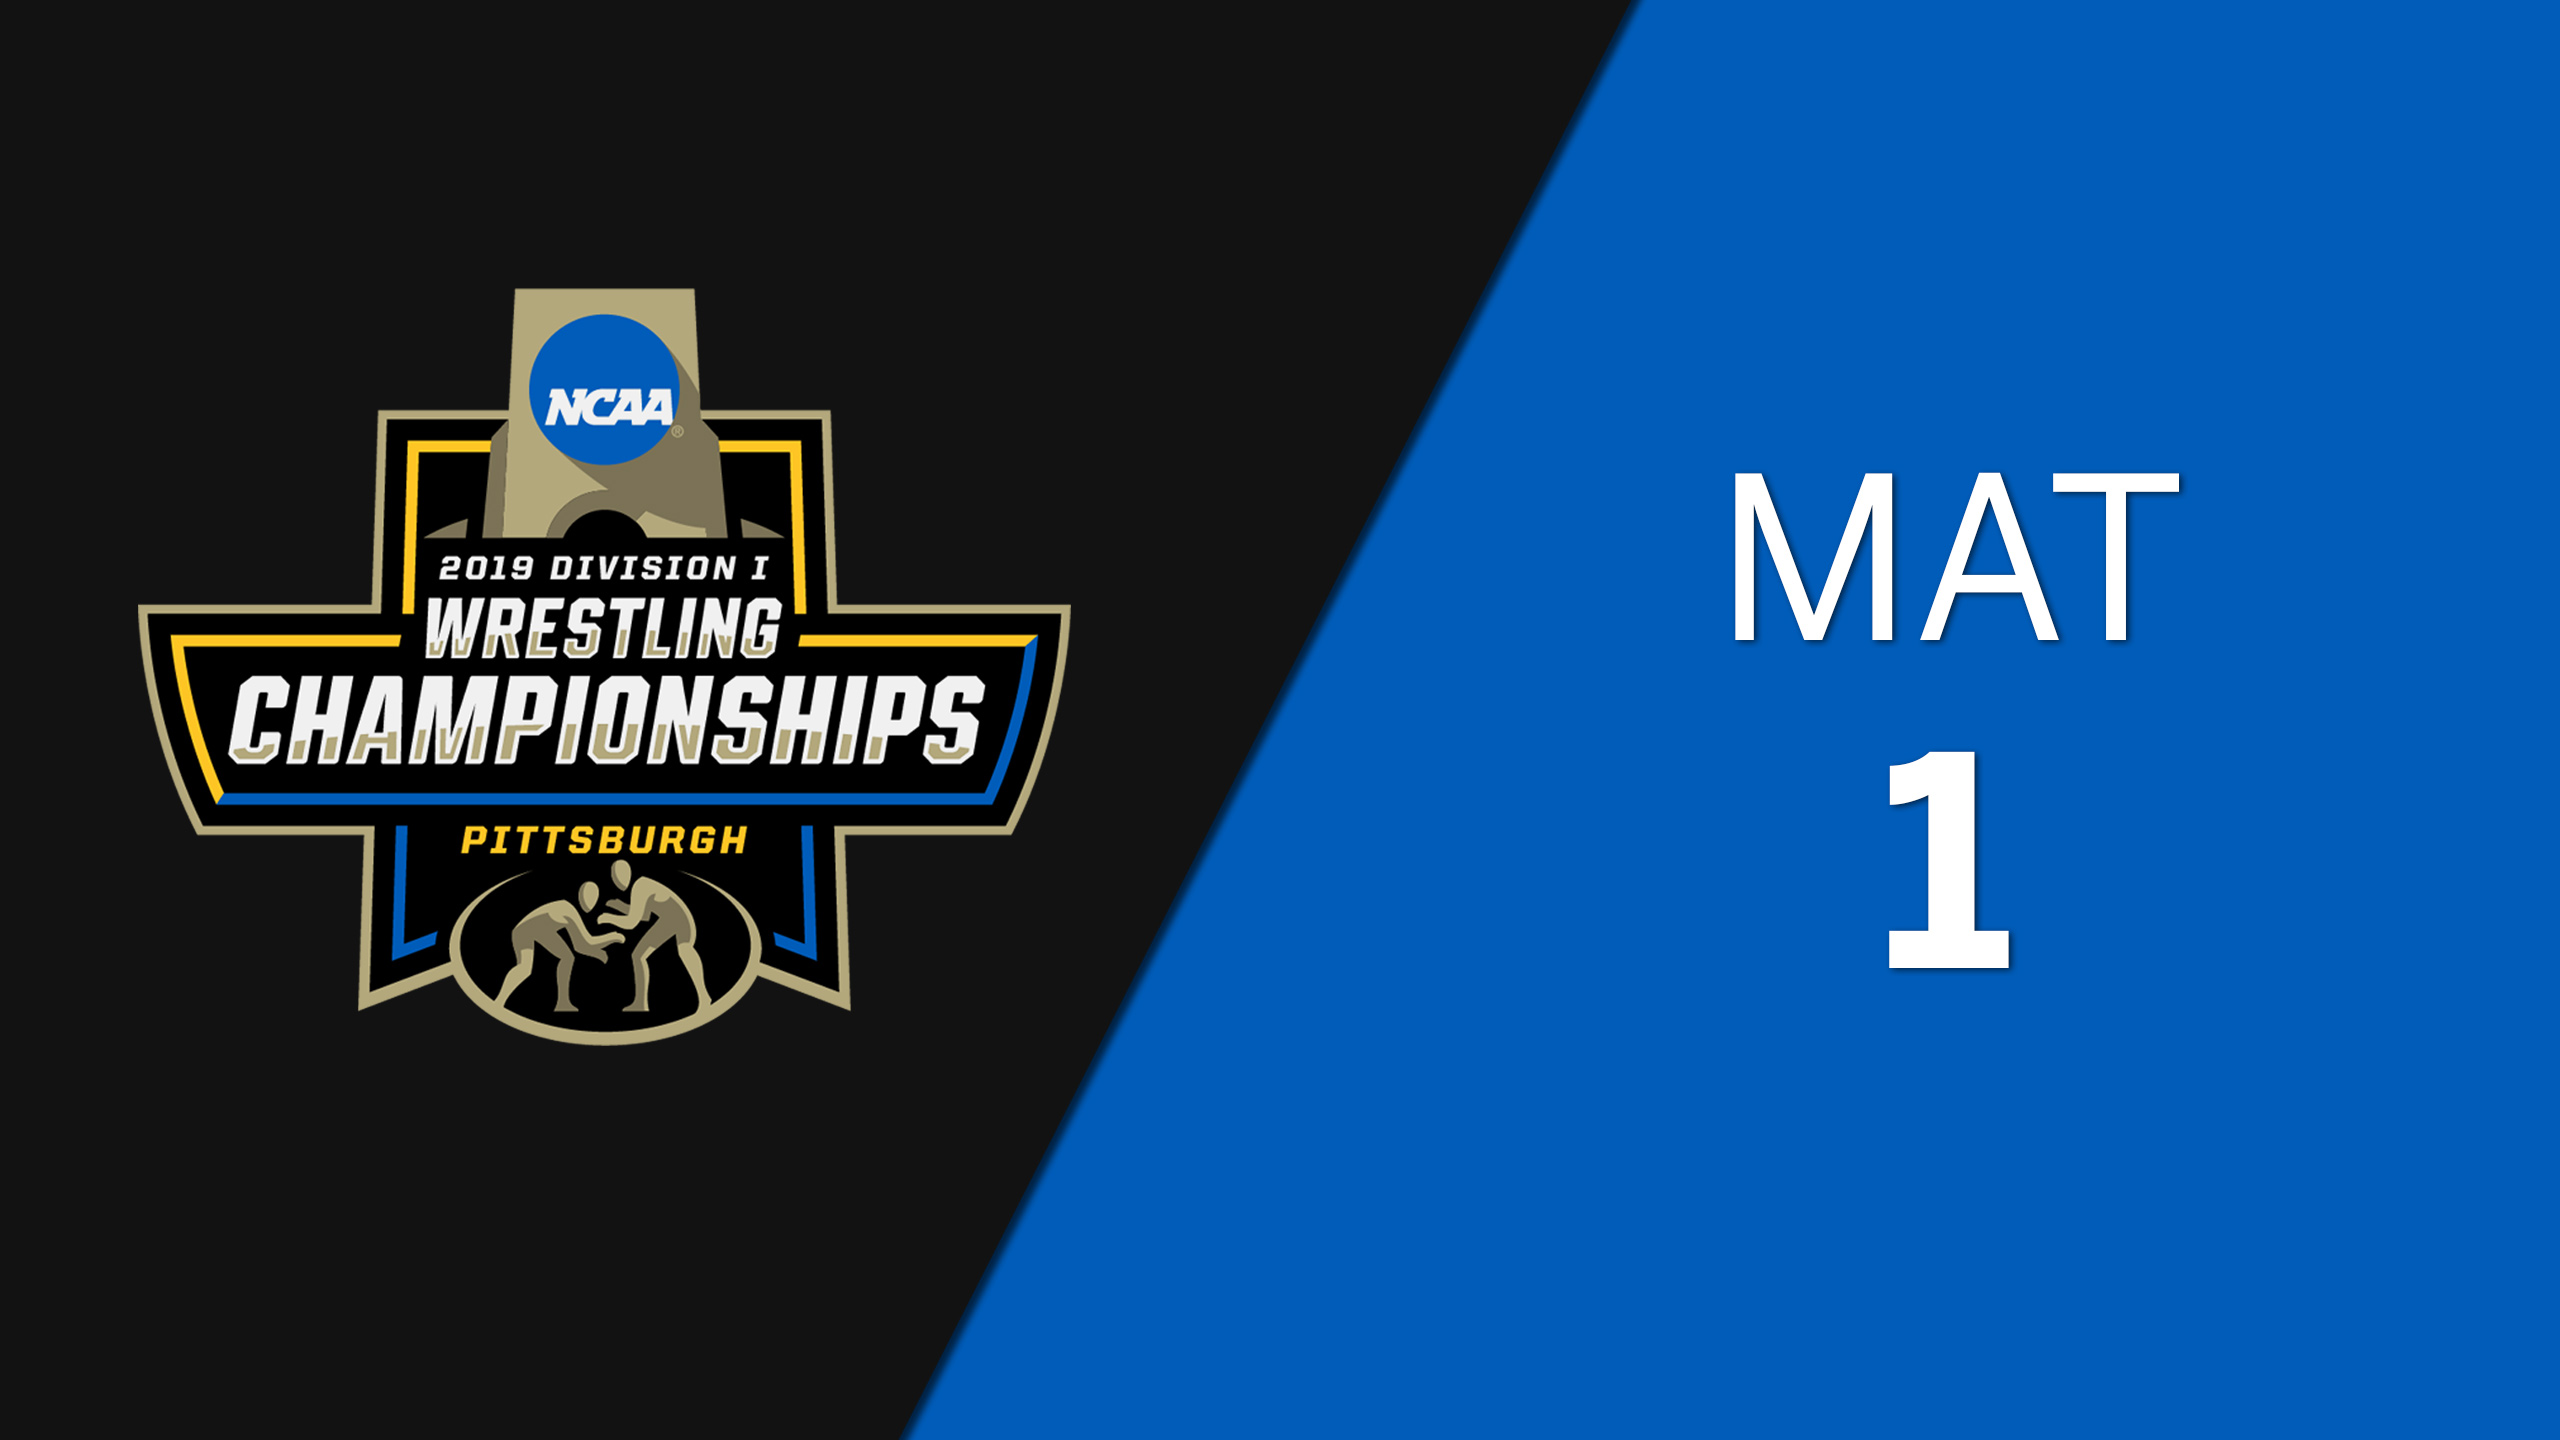 NCAA Wrestling Championship (Mat 1, Second Round)